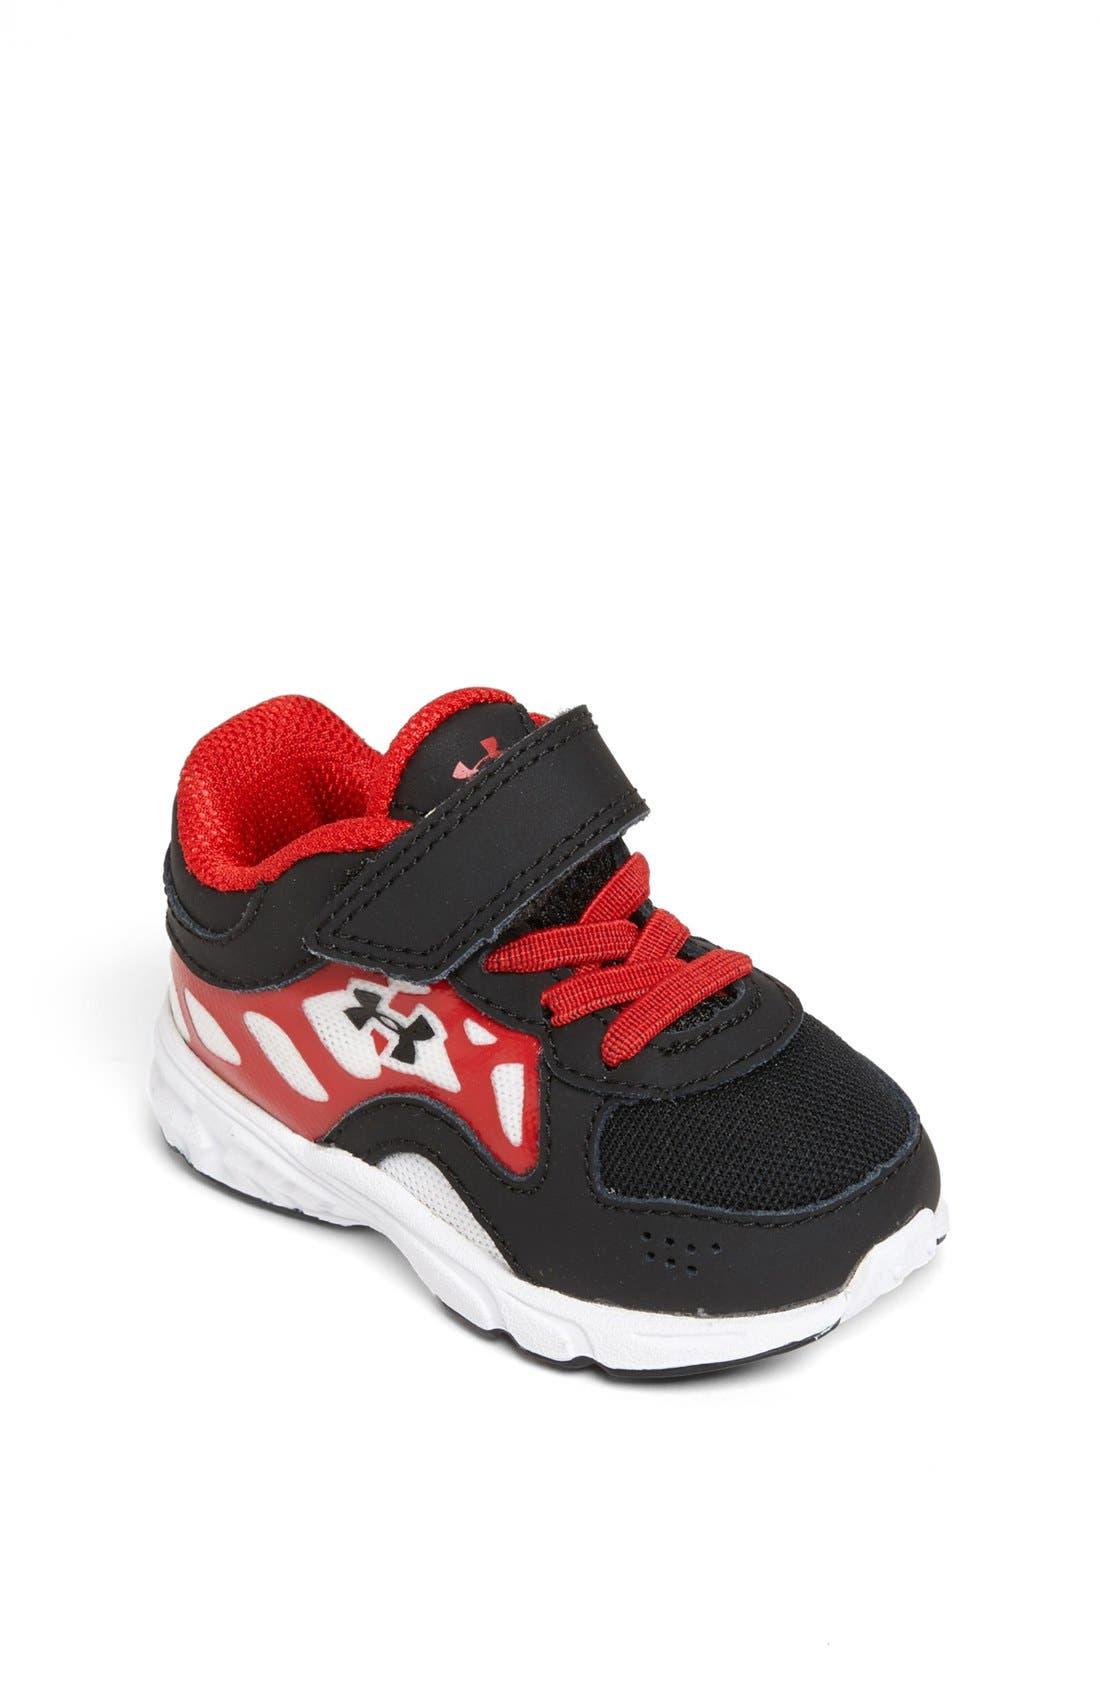 Alternate Image 1 Selected - Under Armour 'Ignite' Sneaker (Baby, Walker & Toddler)